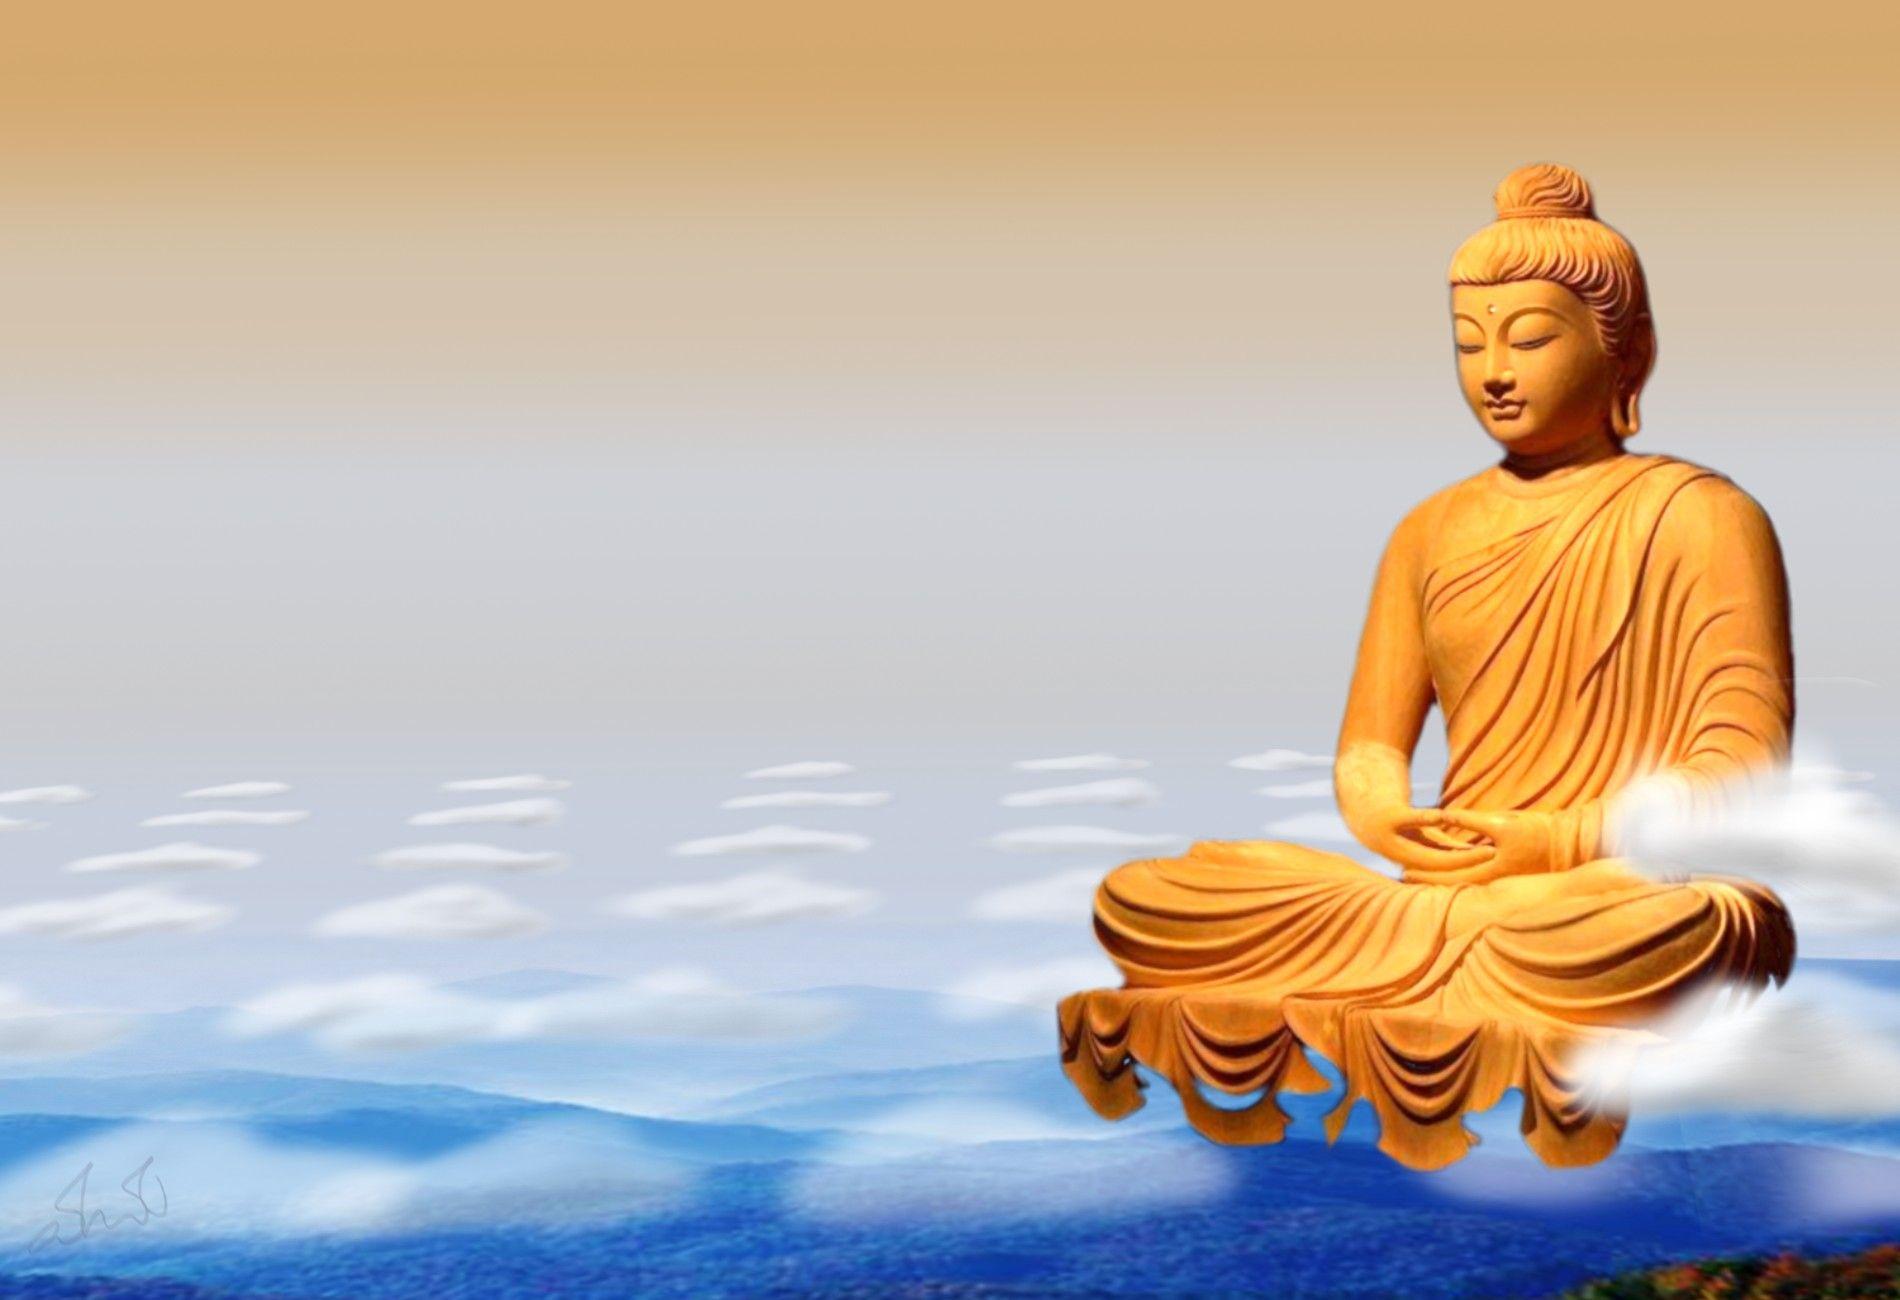 10 invataturi despre viata, transmise posteritatii de catre Buddha